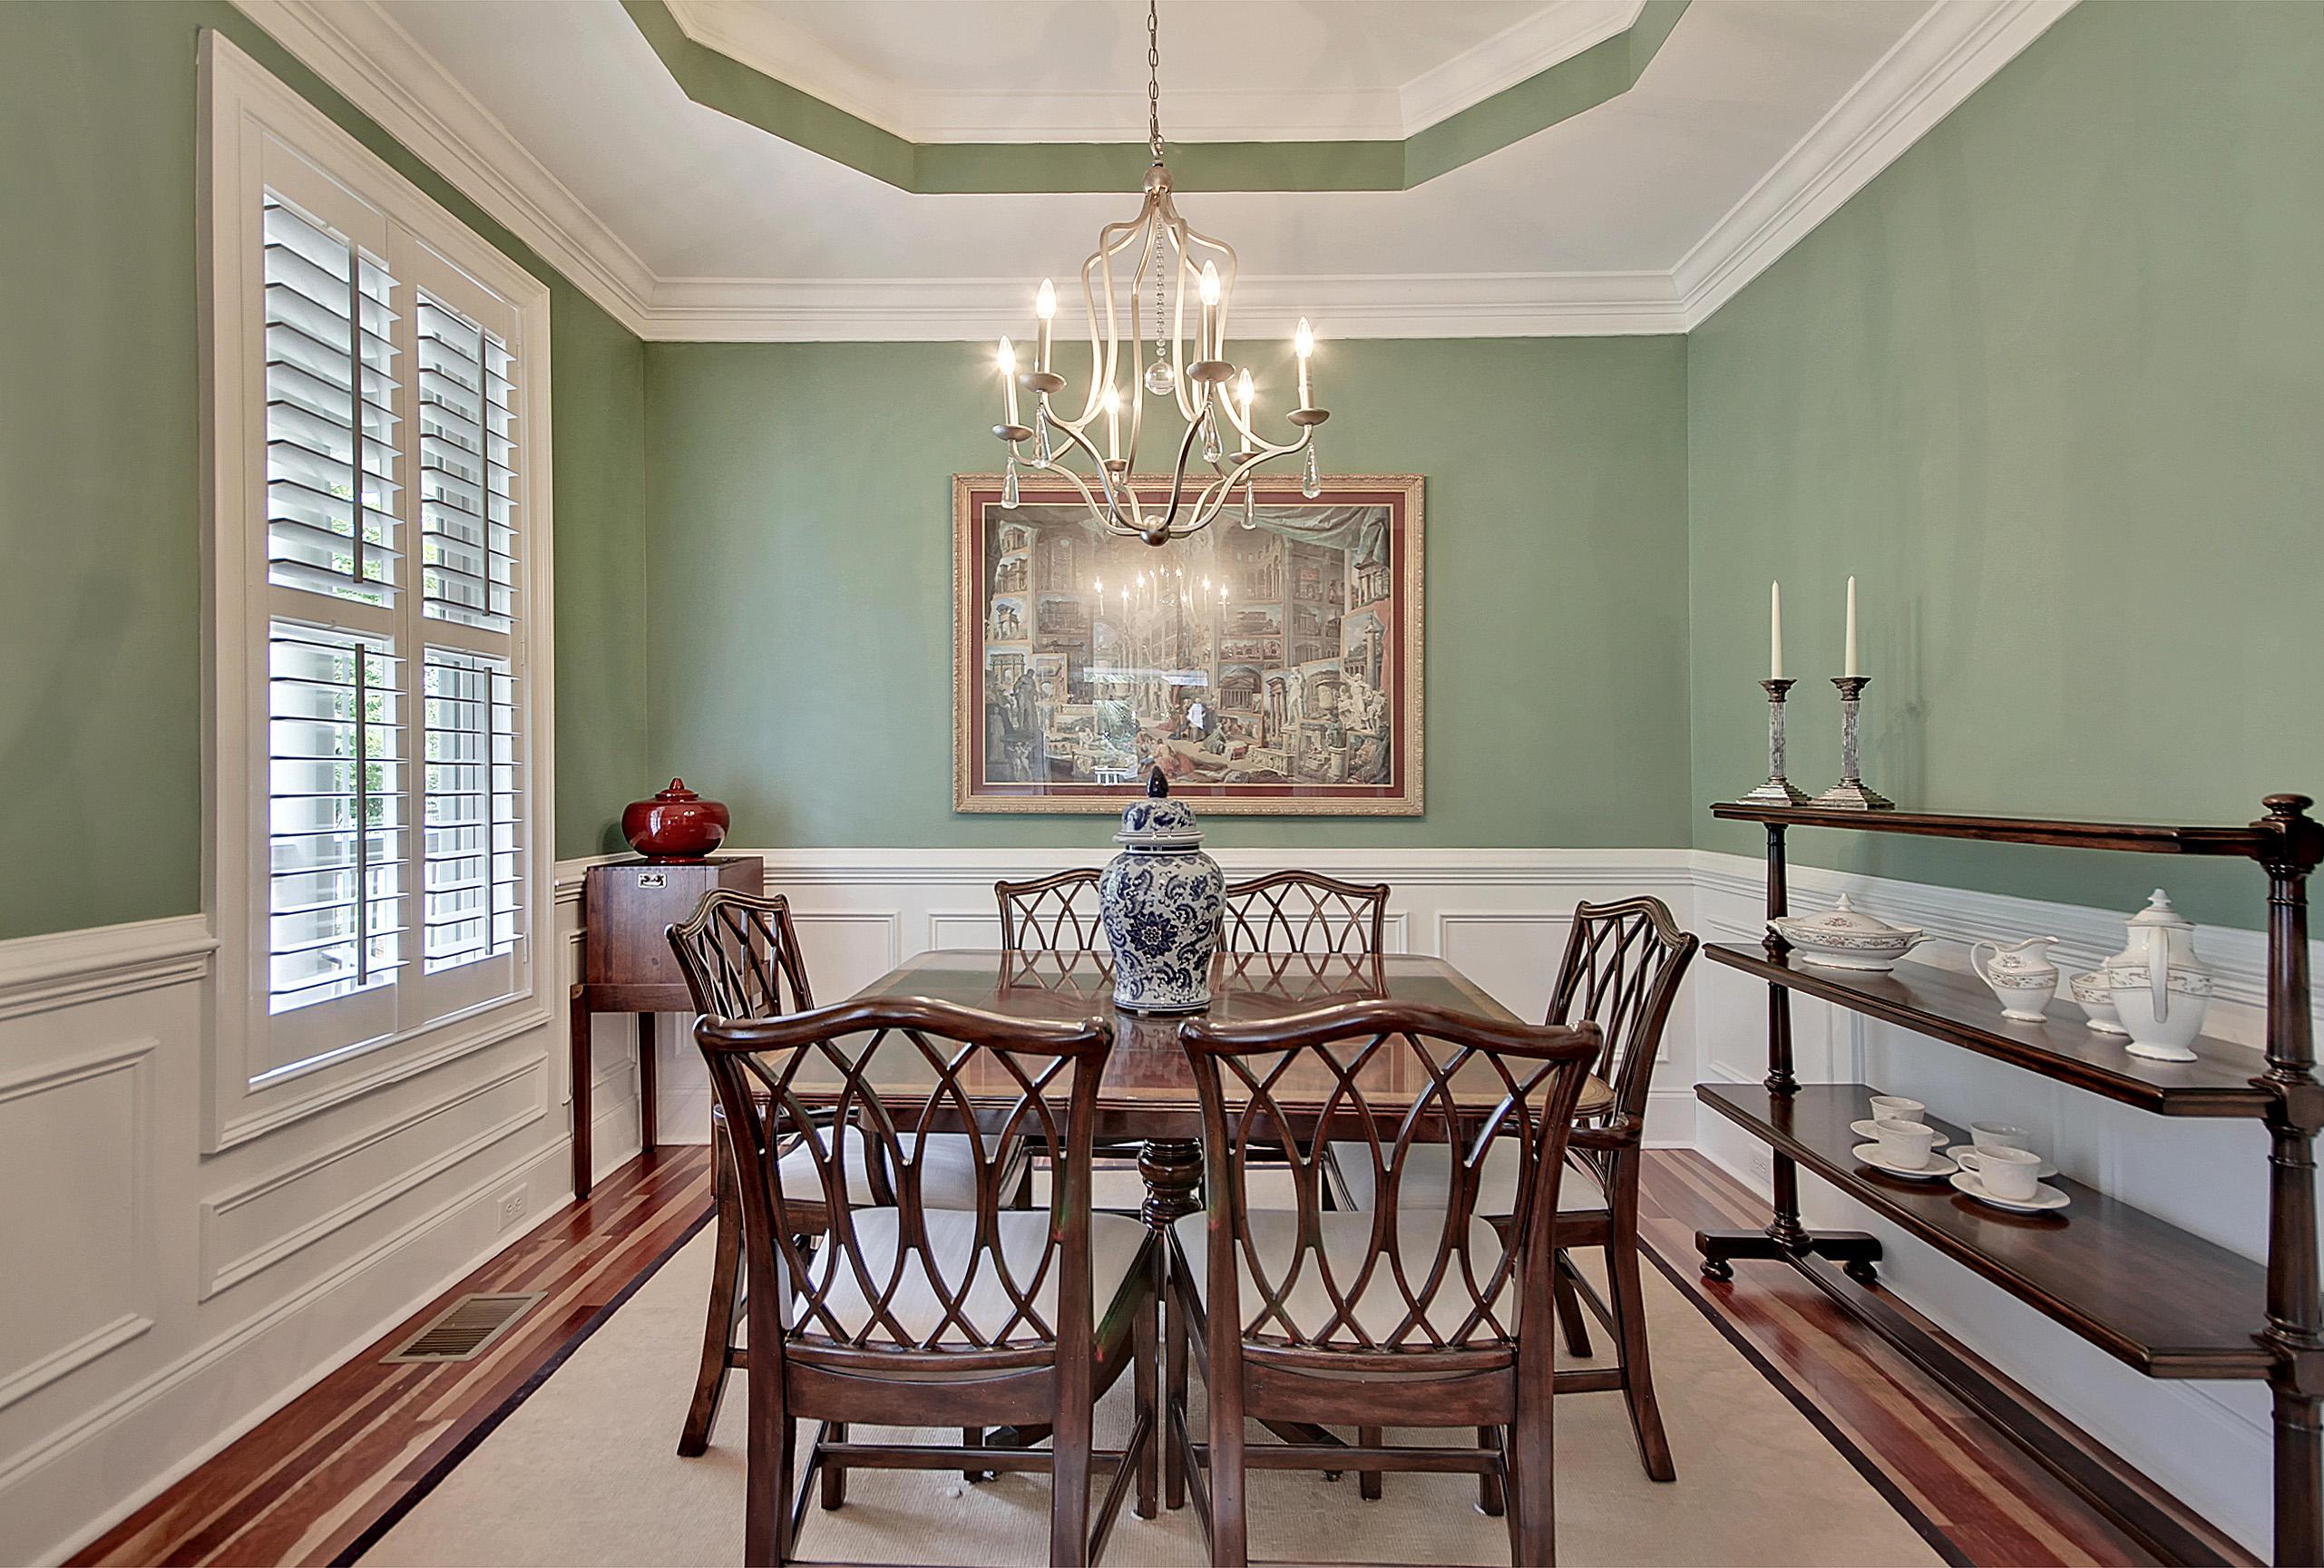 Belle Hall Homes For Sale - 368 Evian, Mount Pleasant, SC - 41